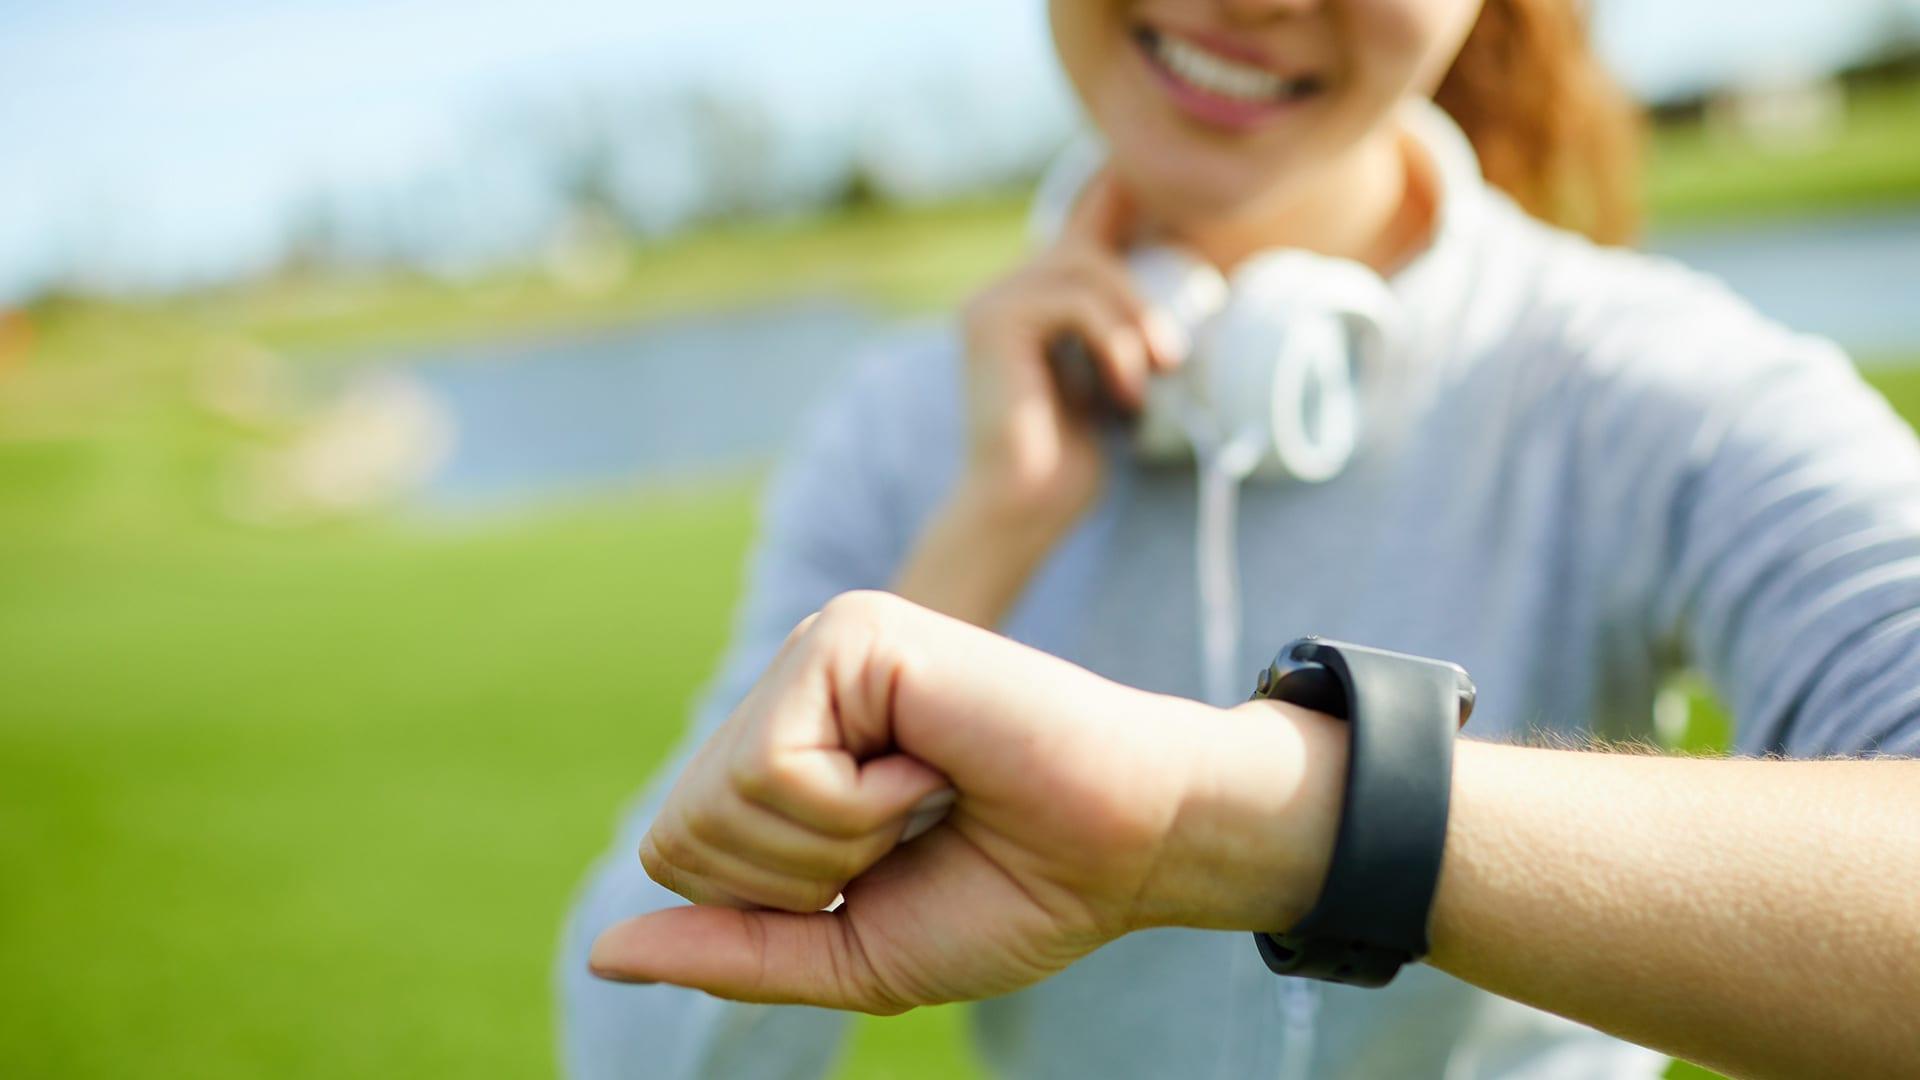 Sporter kijkt op smartwatch